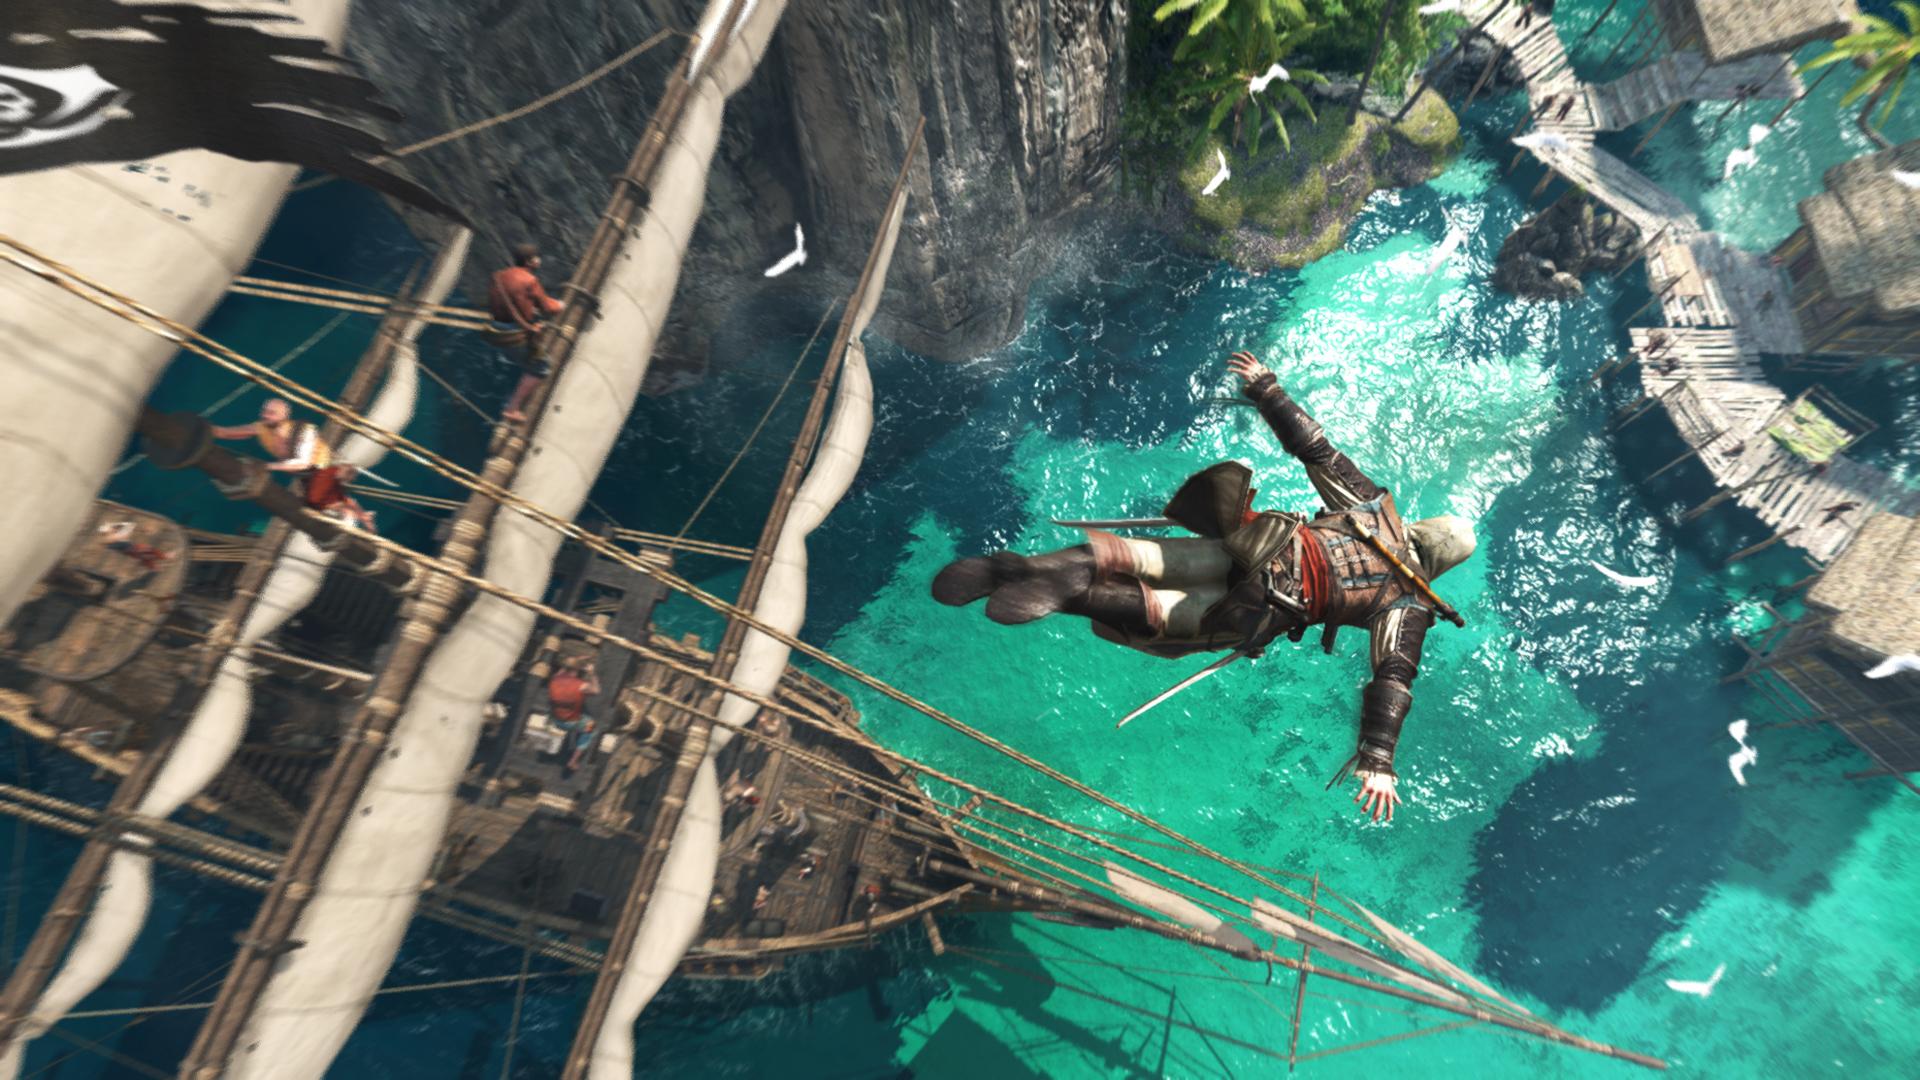 assassins creed 4 patch - Assassin's Creed 4: arriva la super patch da 2 giga